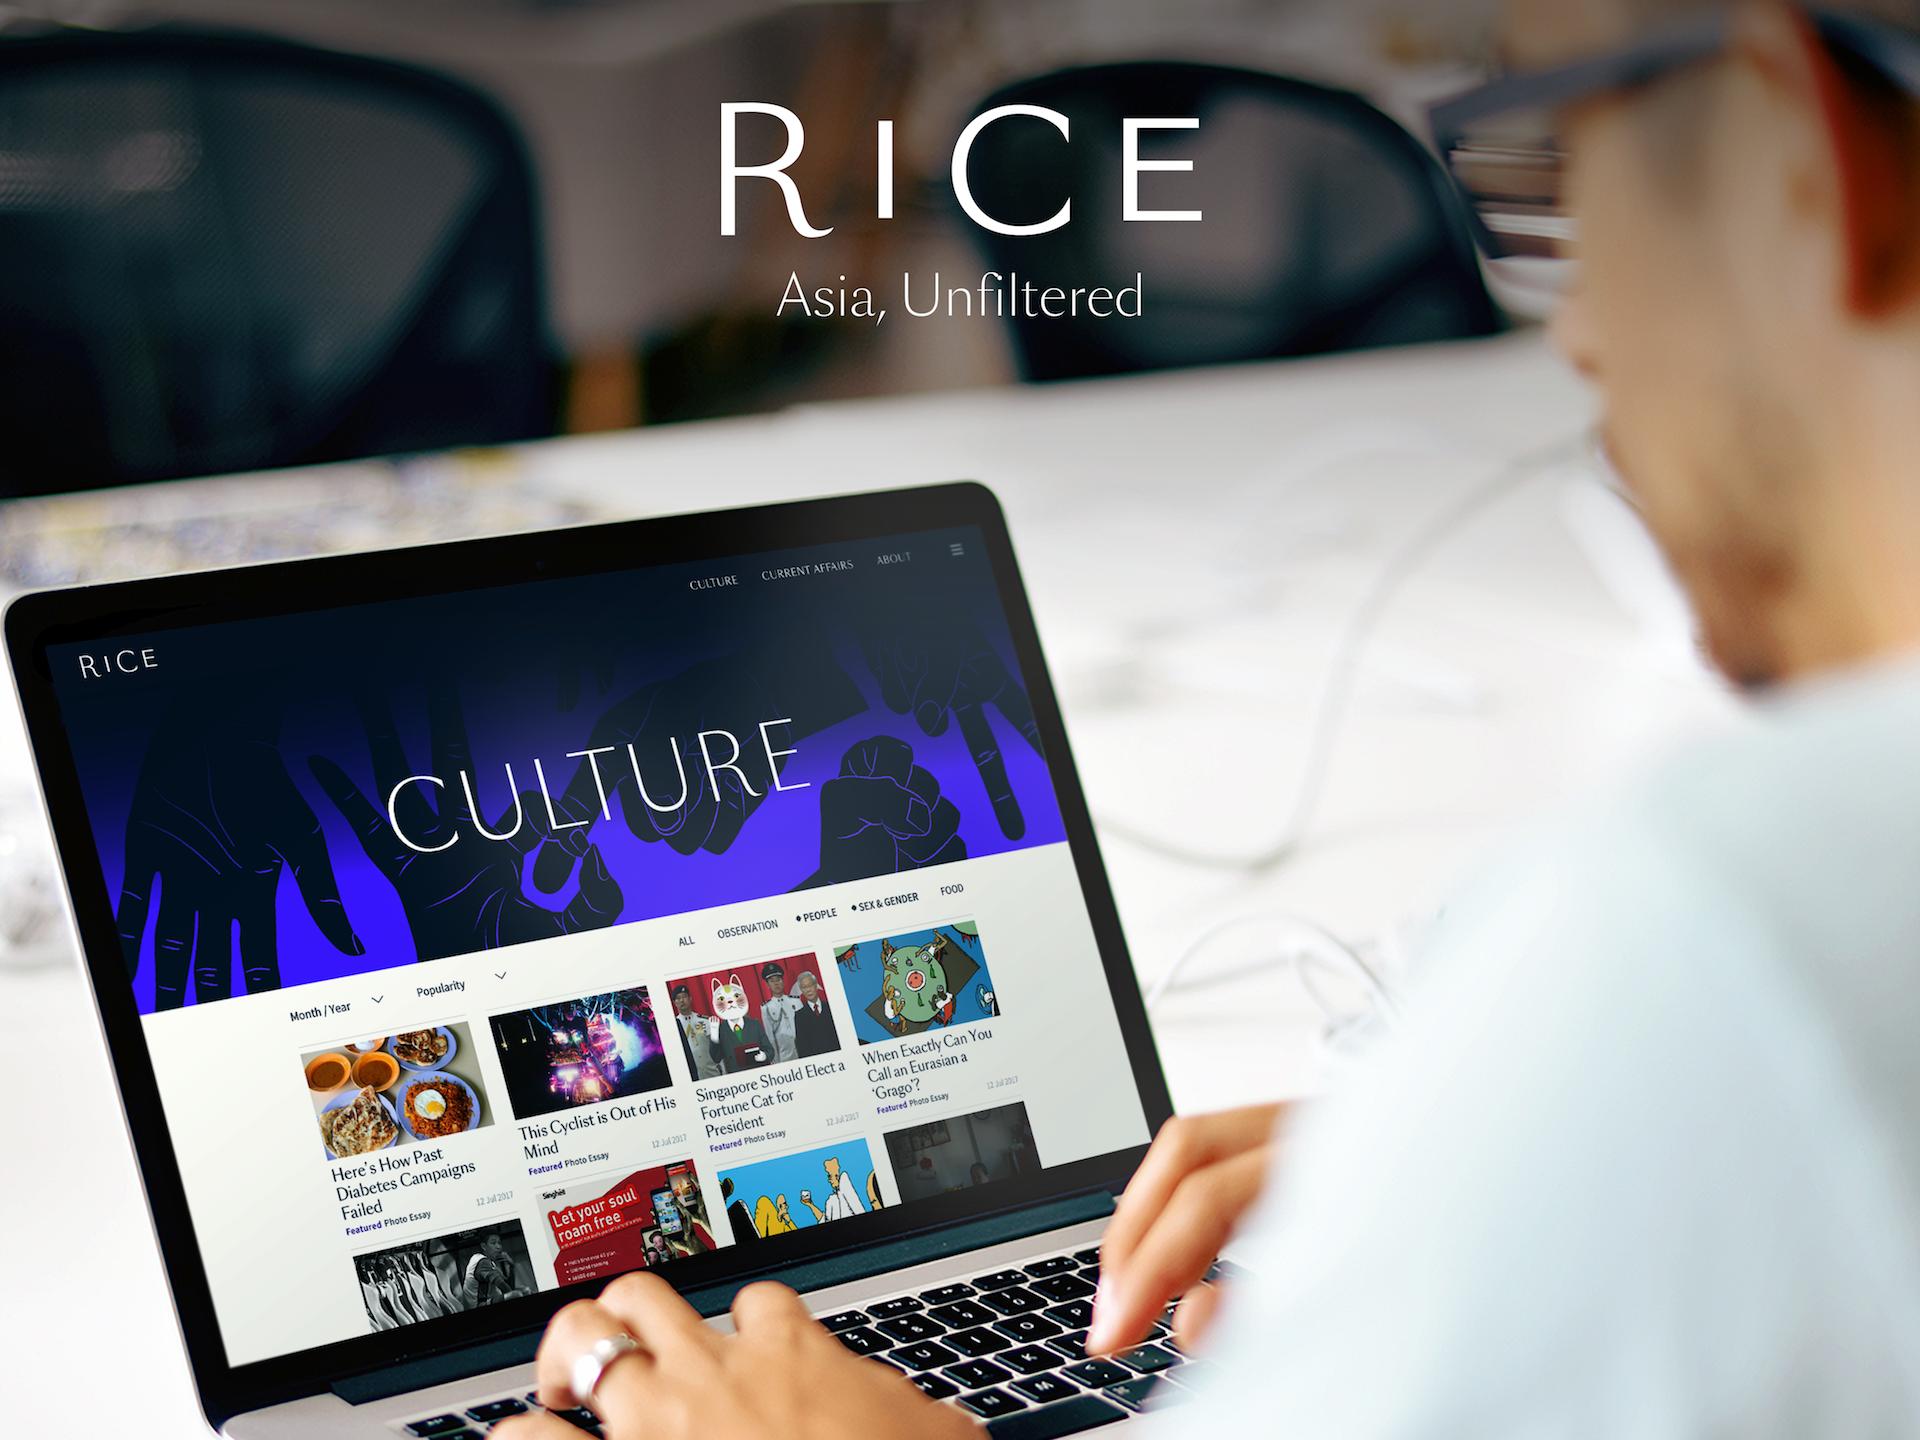 Rice Media, News & Current Affairs